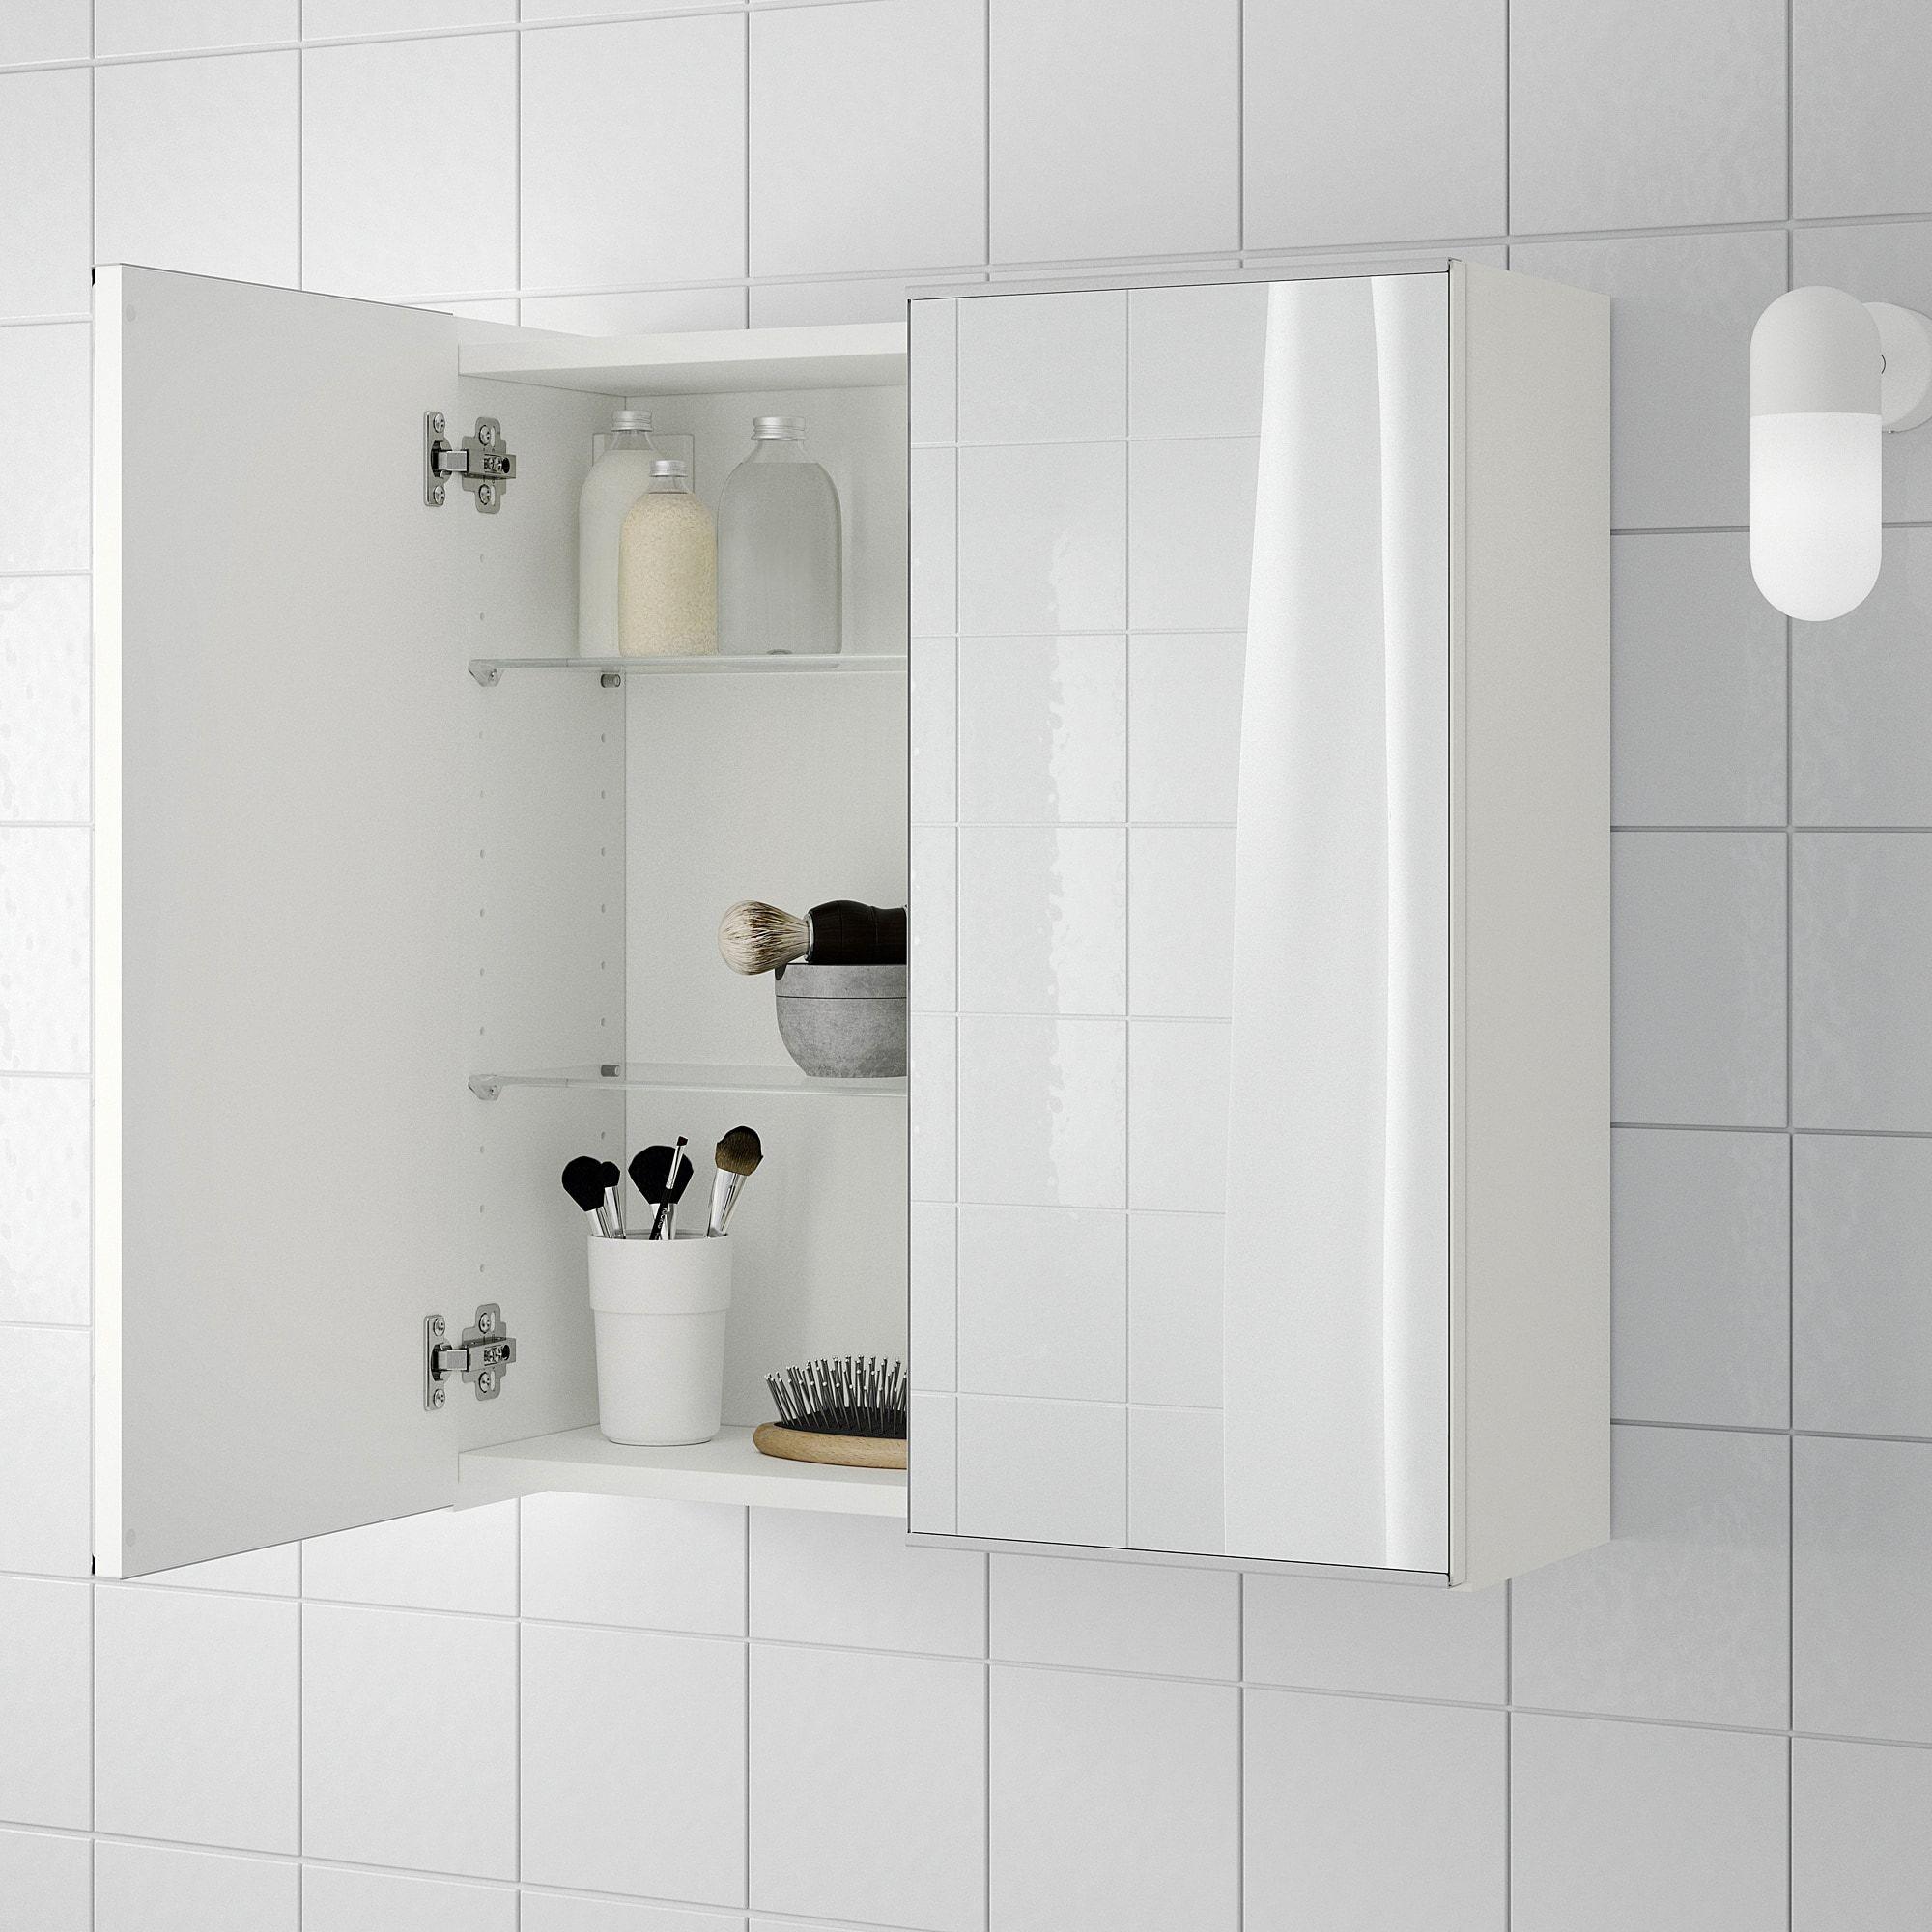 Lillangen Ormaric S Ogledalom I 2 Vrata Bela Ikea In 2020 Bathroom Mirror Cabinet Mirror Cabinets Bathroom Cabinets Designs